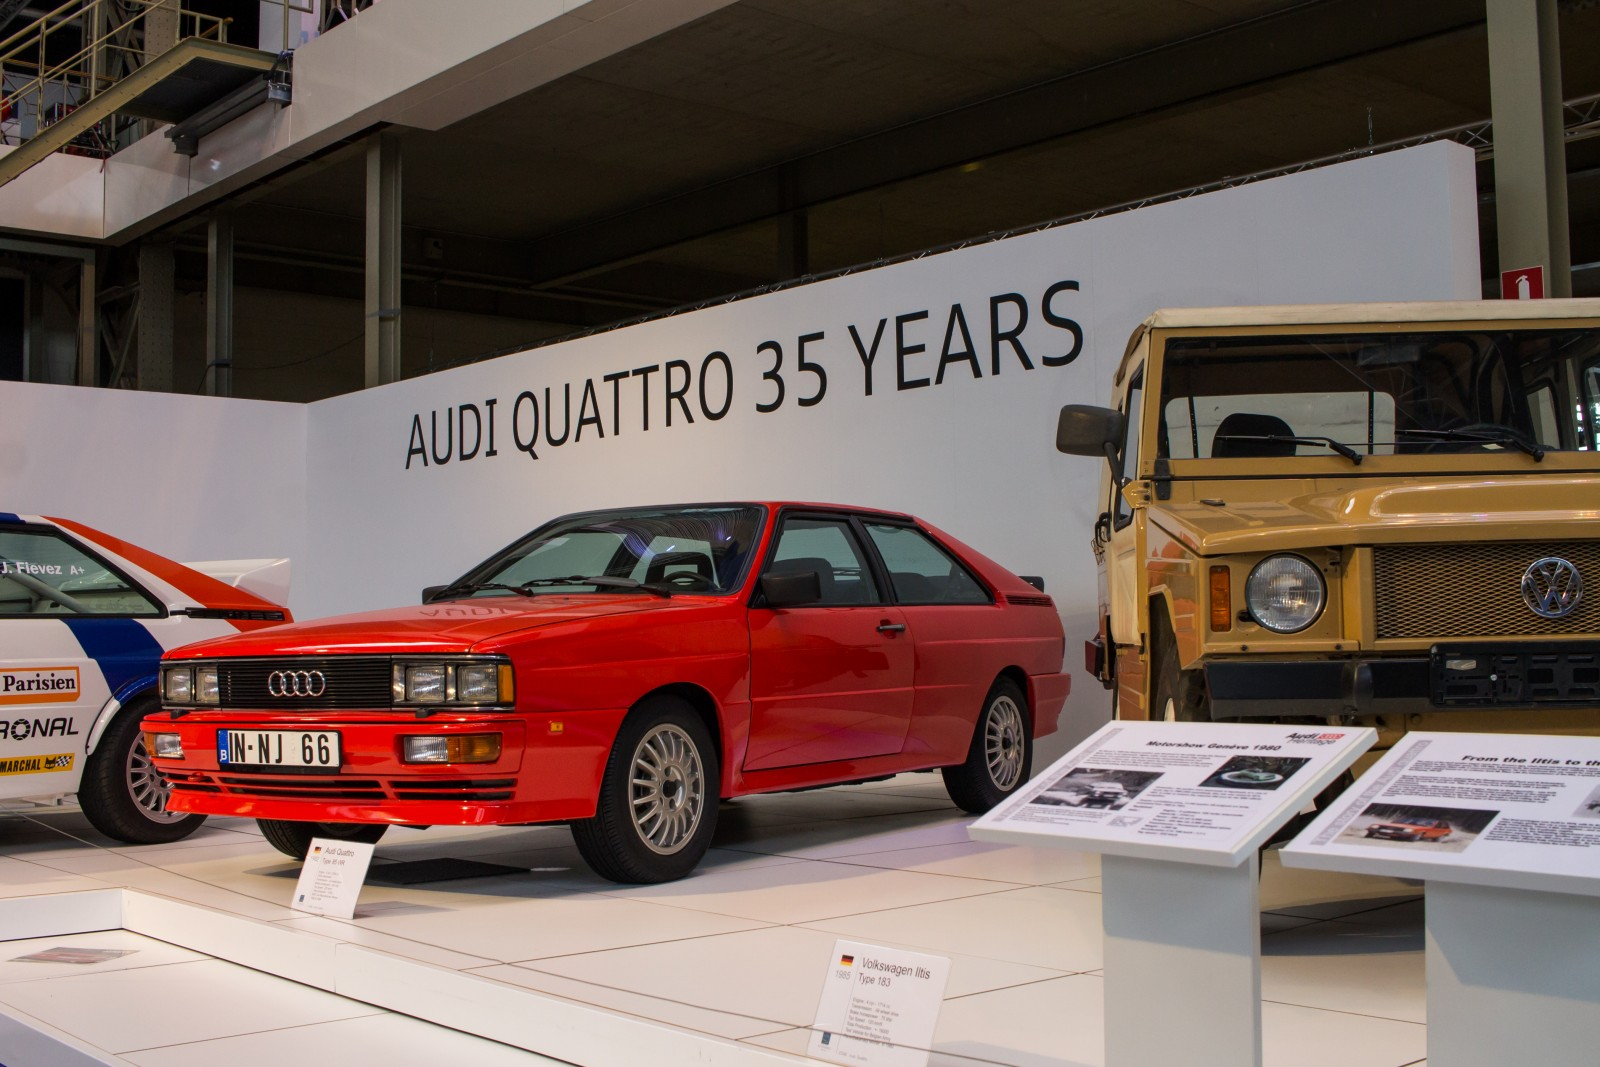 Audi Quattro exposition in the Autoworld Brussels